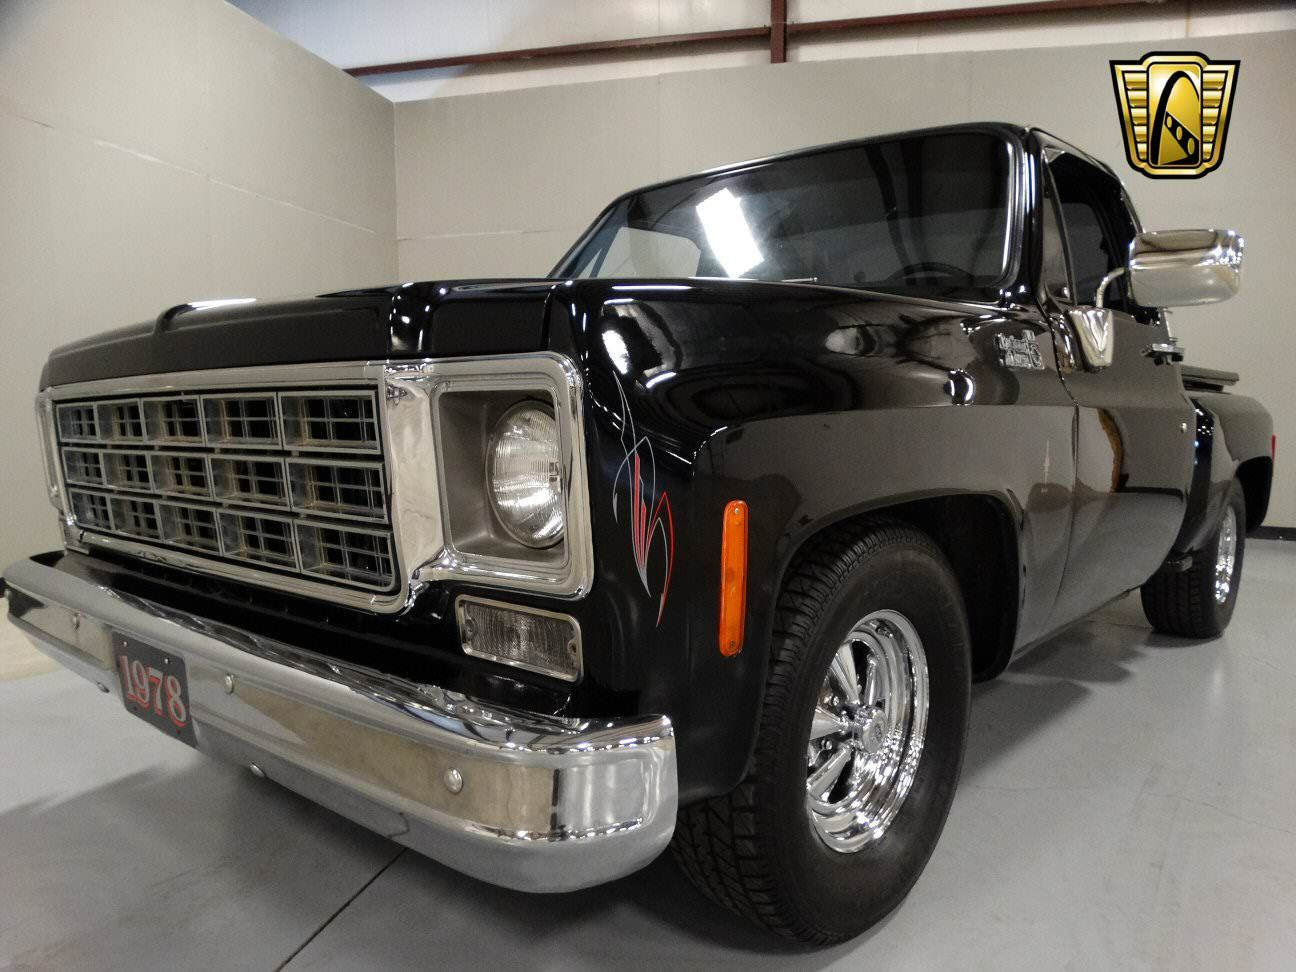 1978 chevy c10 autotrader classics 1978 chevrolet c10 truck black 8 cylinder  [ 1296 x 972 Pixel ]